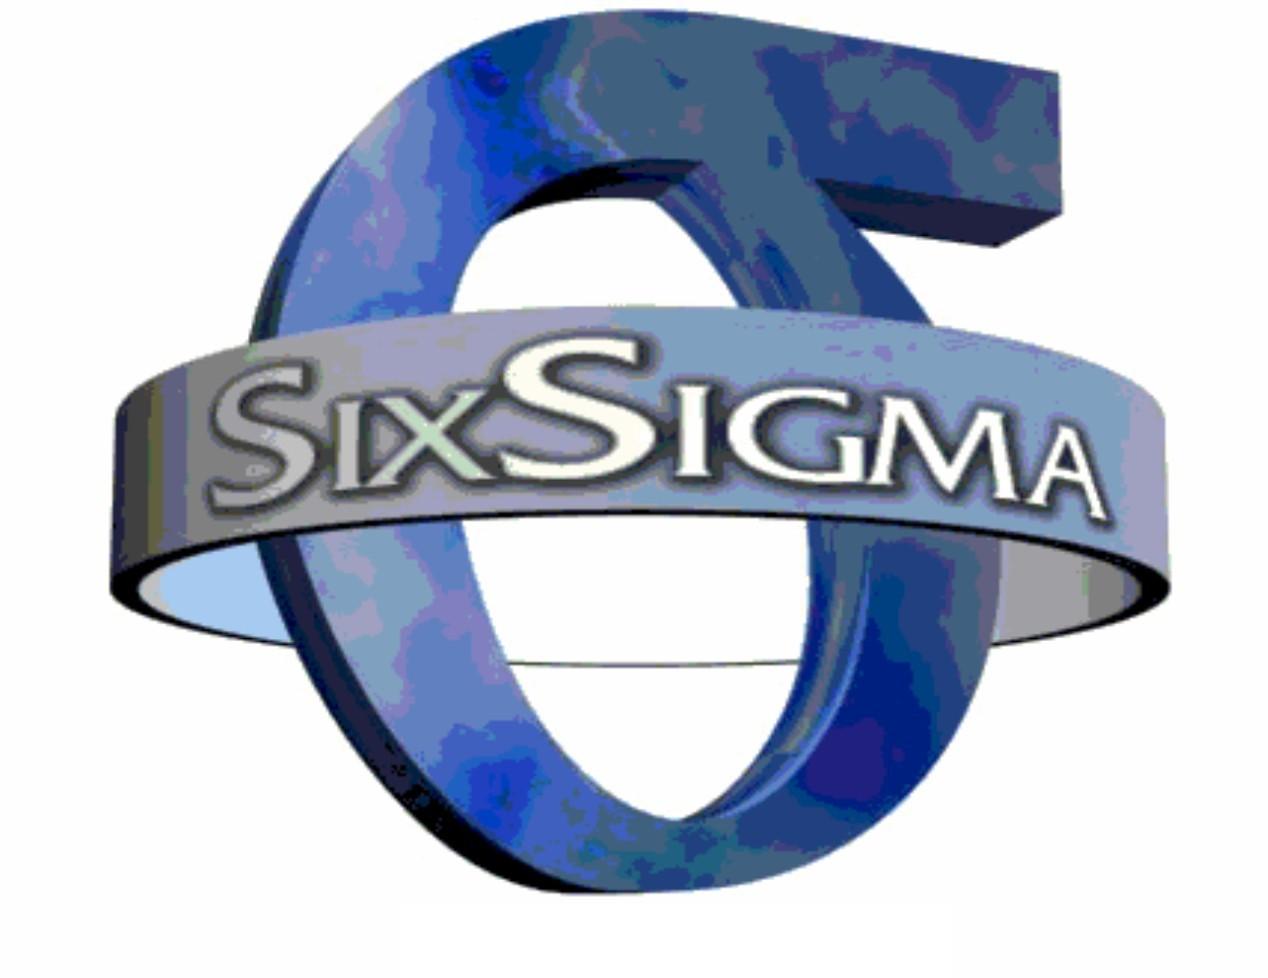 Macobiesix Sigma Certification Six Sigma Certification Program